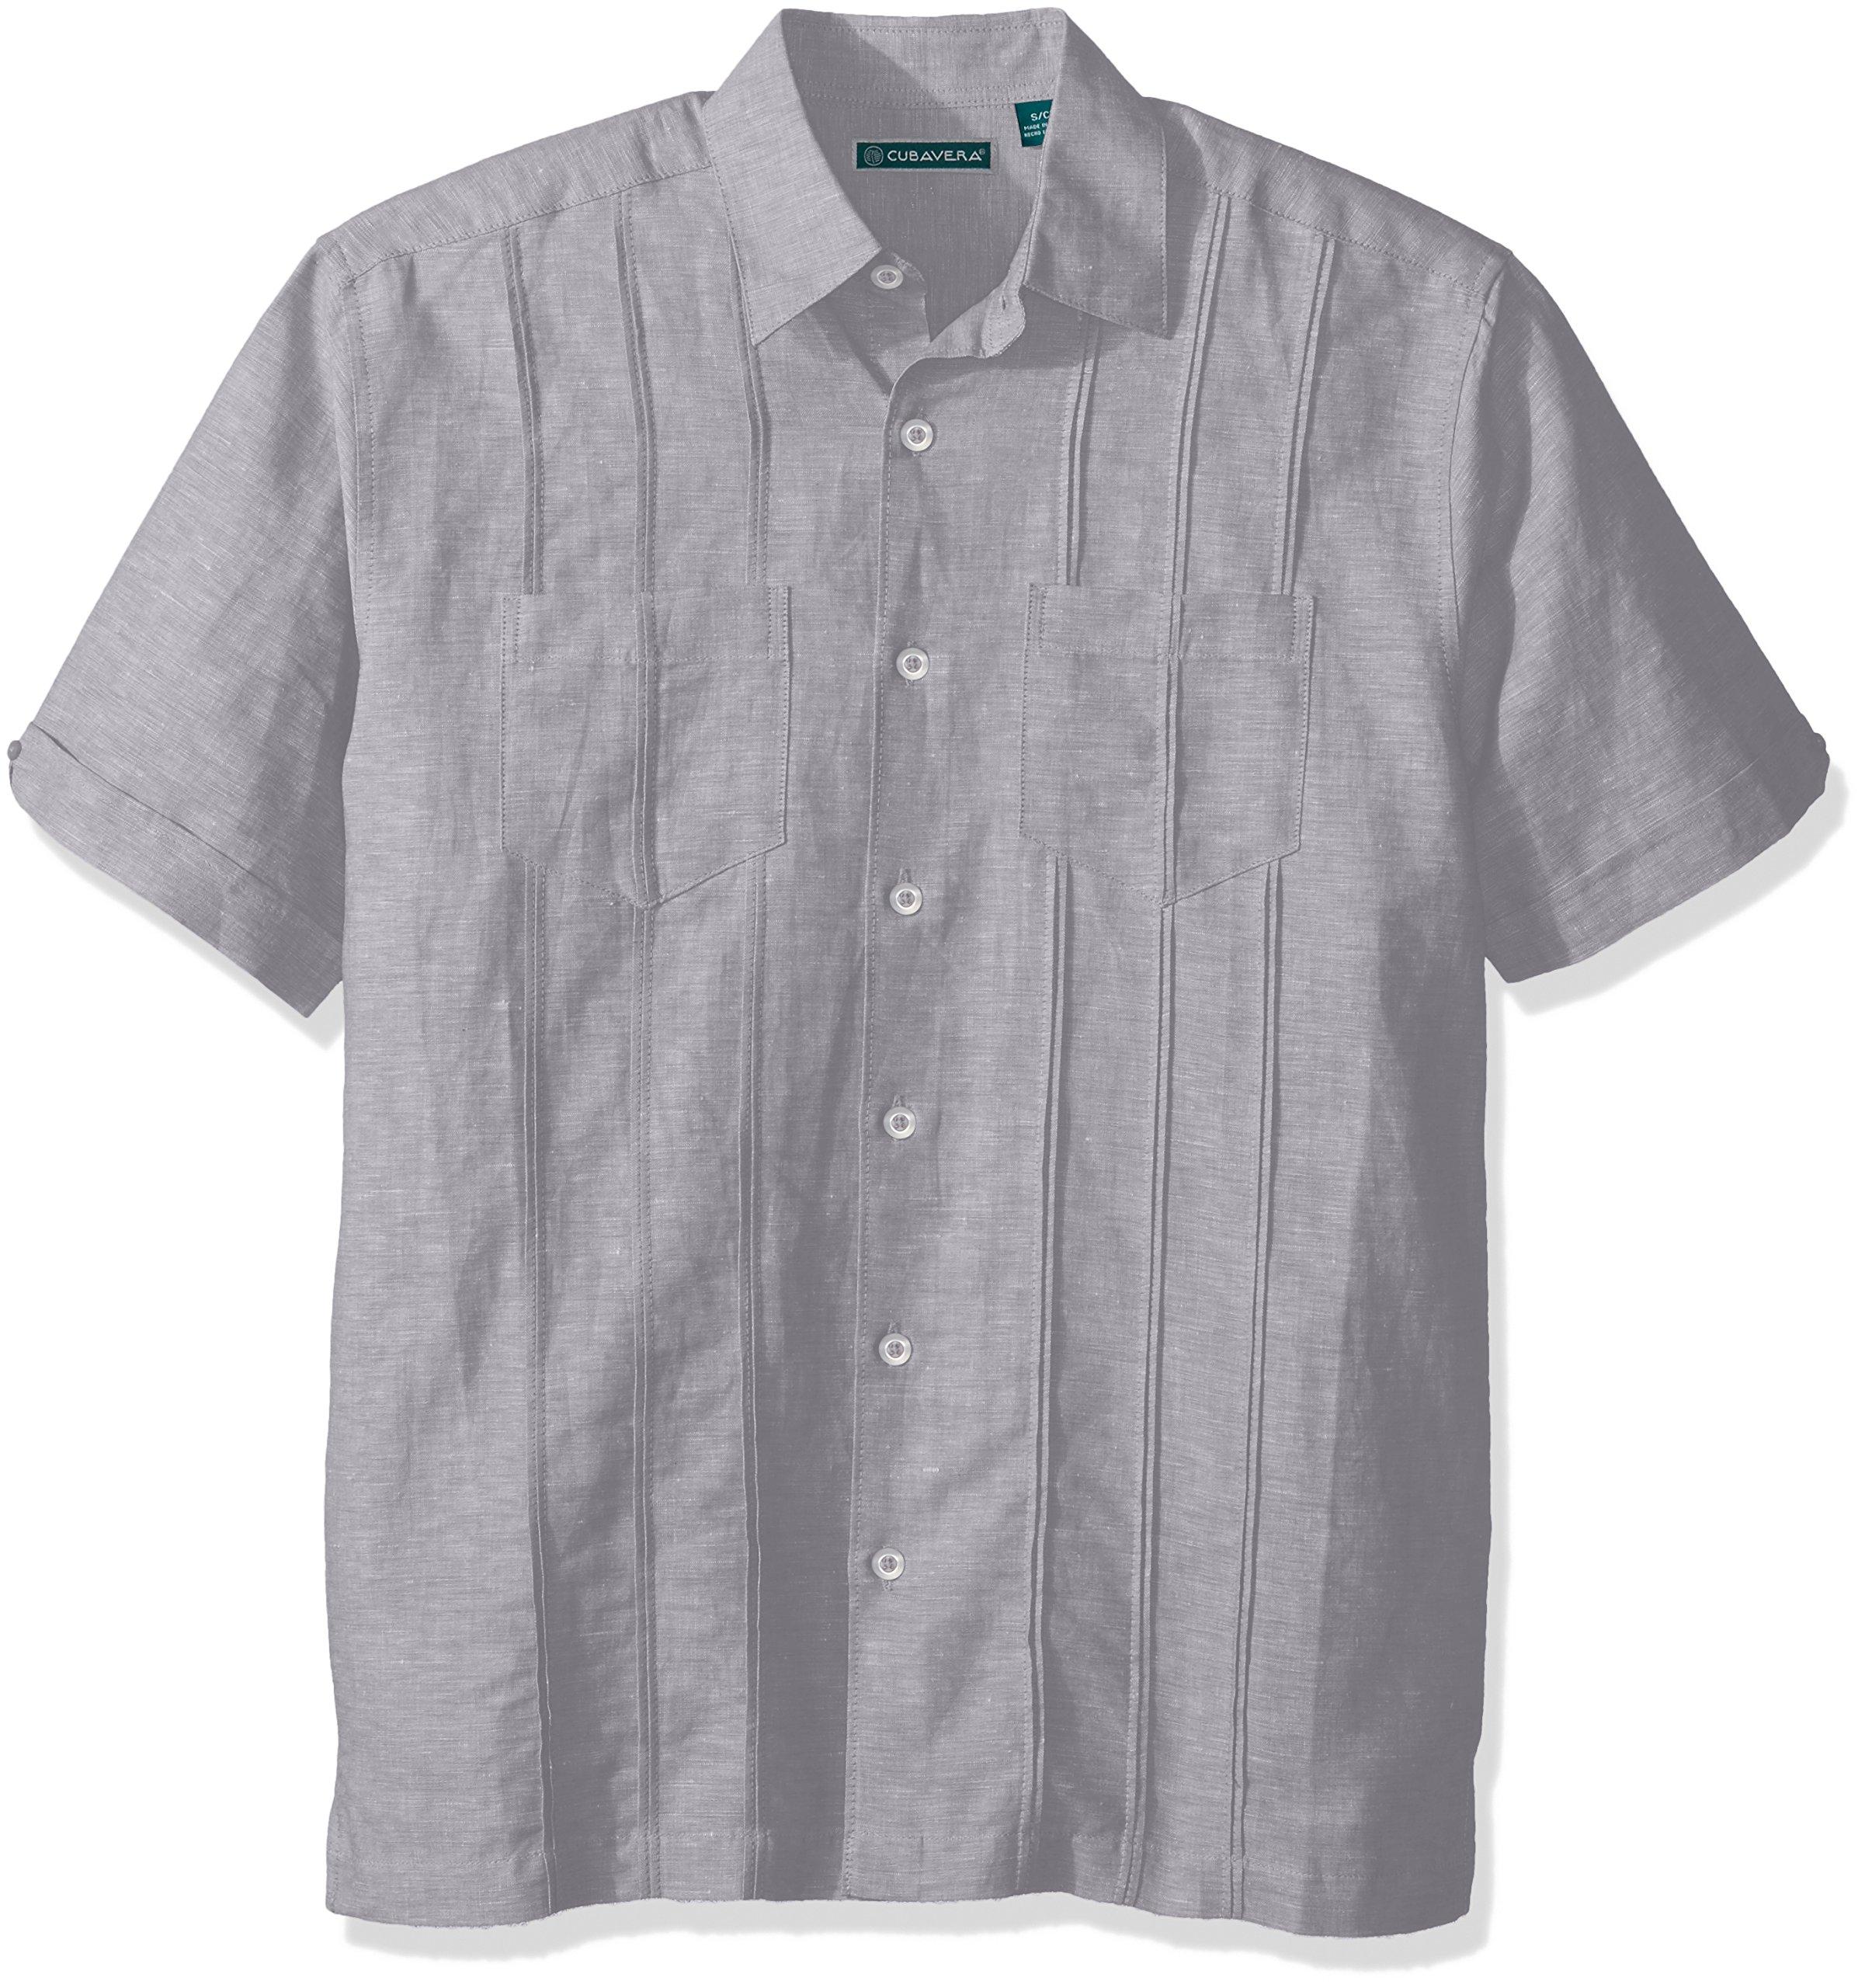 Cubavera Men's Short Sleeve Linen-Blend Shirt with Two Top Pockets and Pleats, Sleet, Large